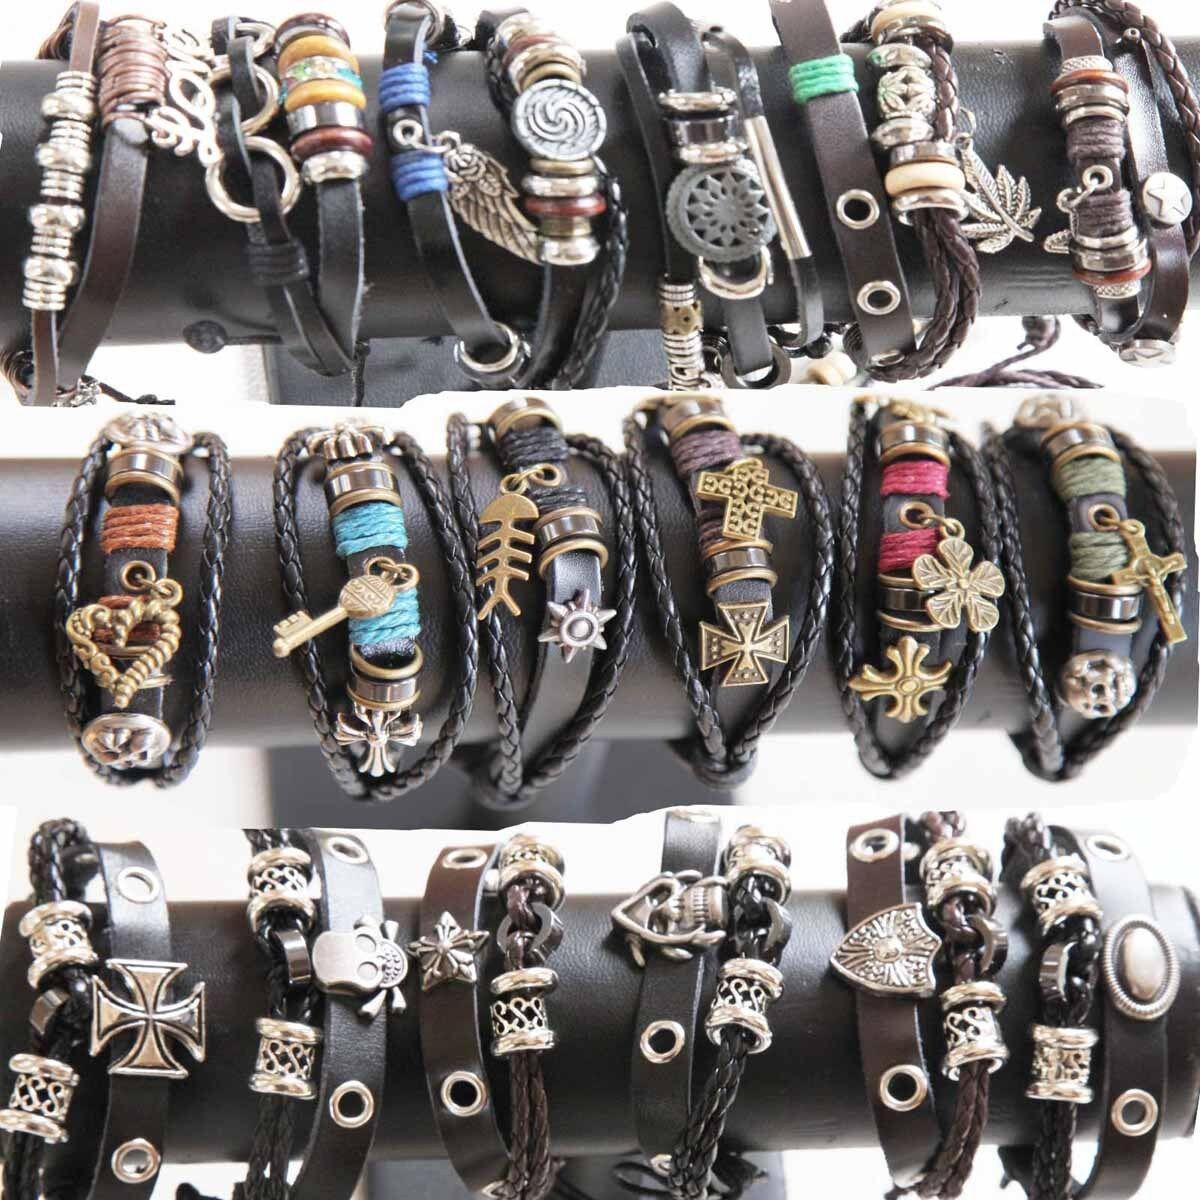 Wholesale Lots 36pcs Mixed lots Genuine Leather Bracelet Cuff Punk Tribal Ethnic